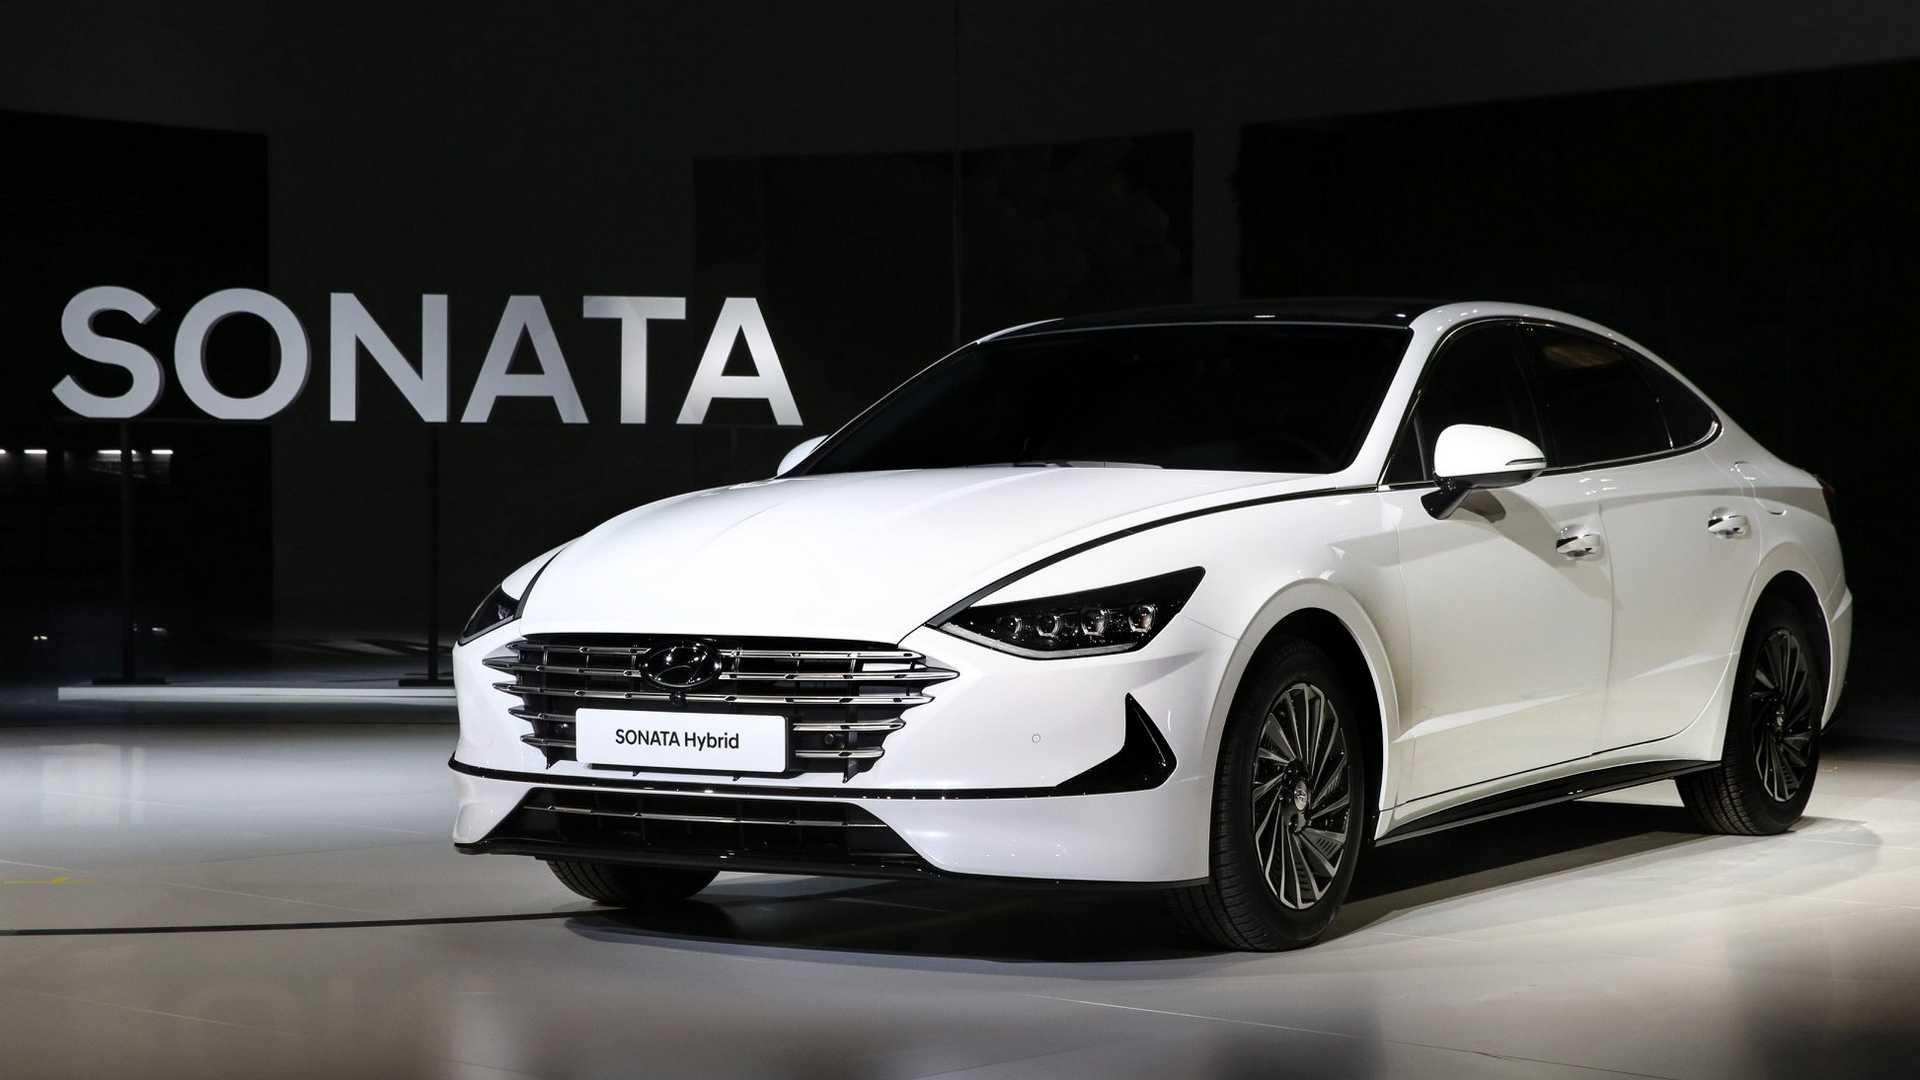 2020 Hyundai Sonata Hybrid Debuts with Solar Roof 7